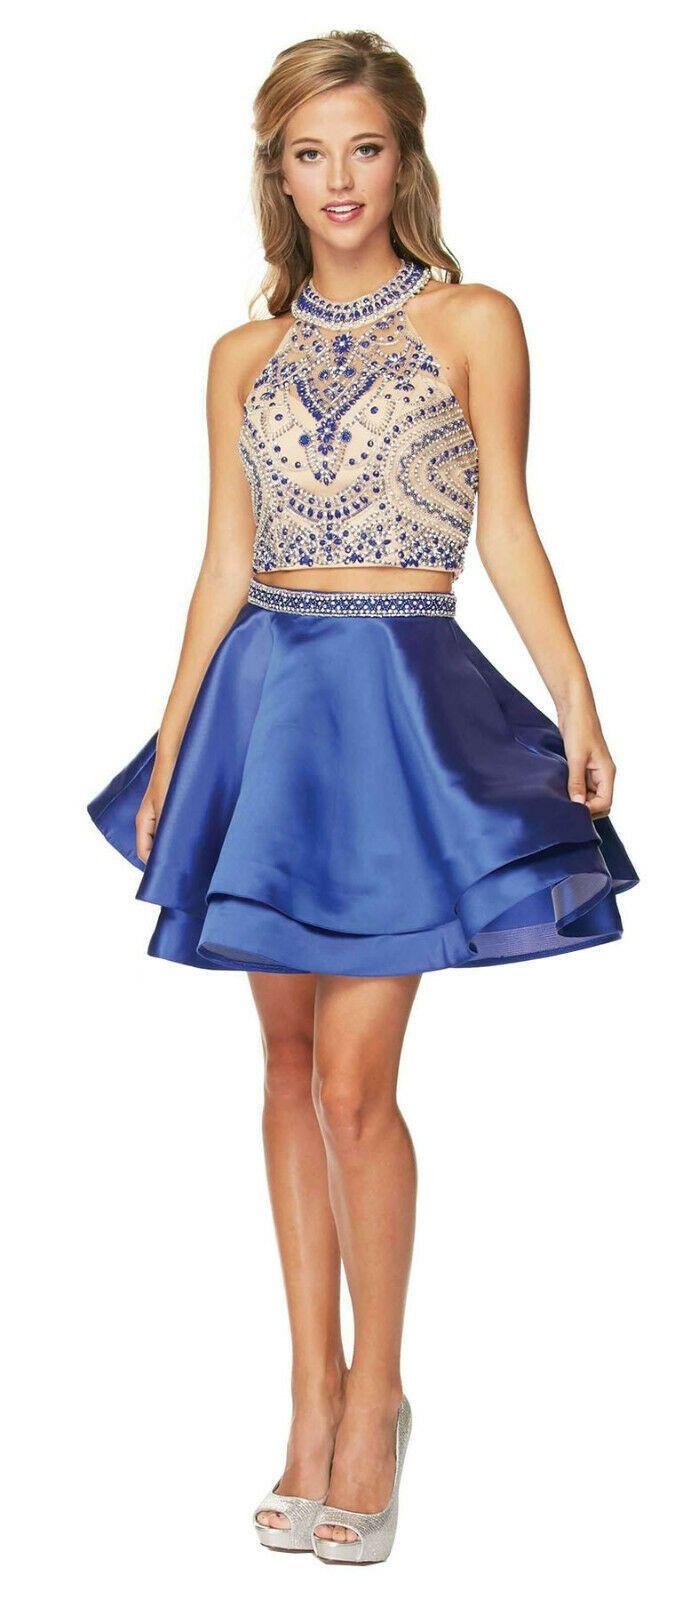 12+ Semi formal dresses for women ideas information